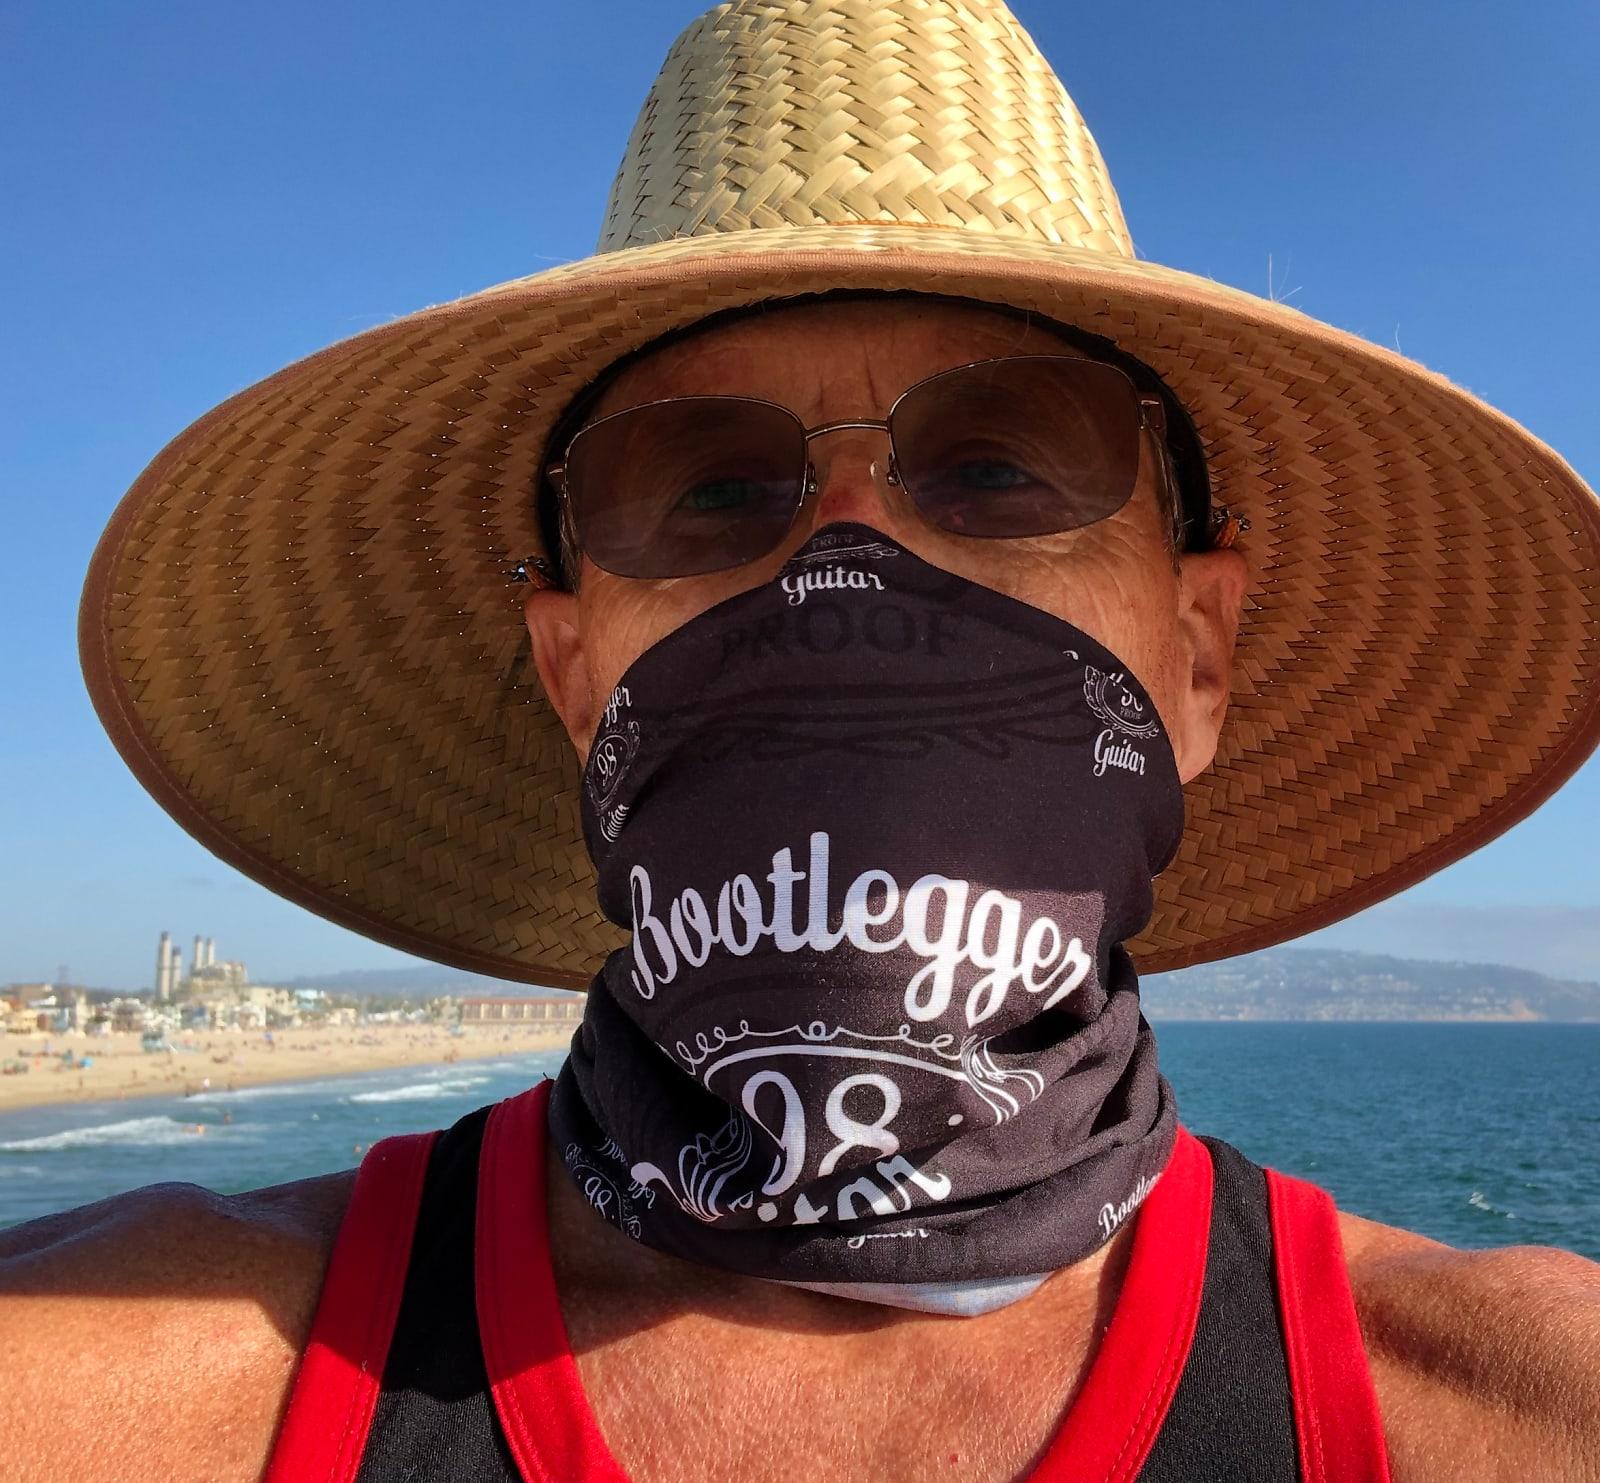 Bootlegger Guitar Bootlegger Guitar 98 Proof Hoo Rag 2020 Mask Bandanna Face Cover